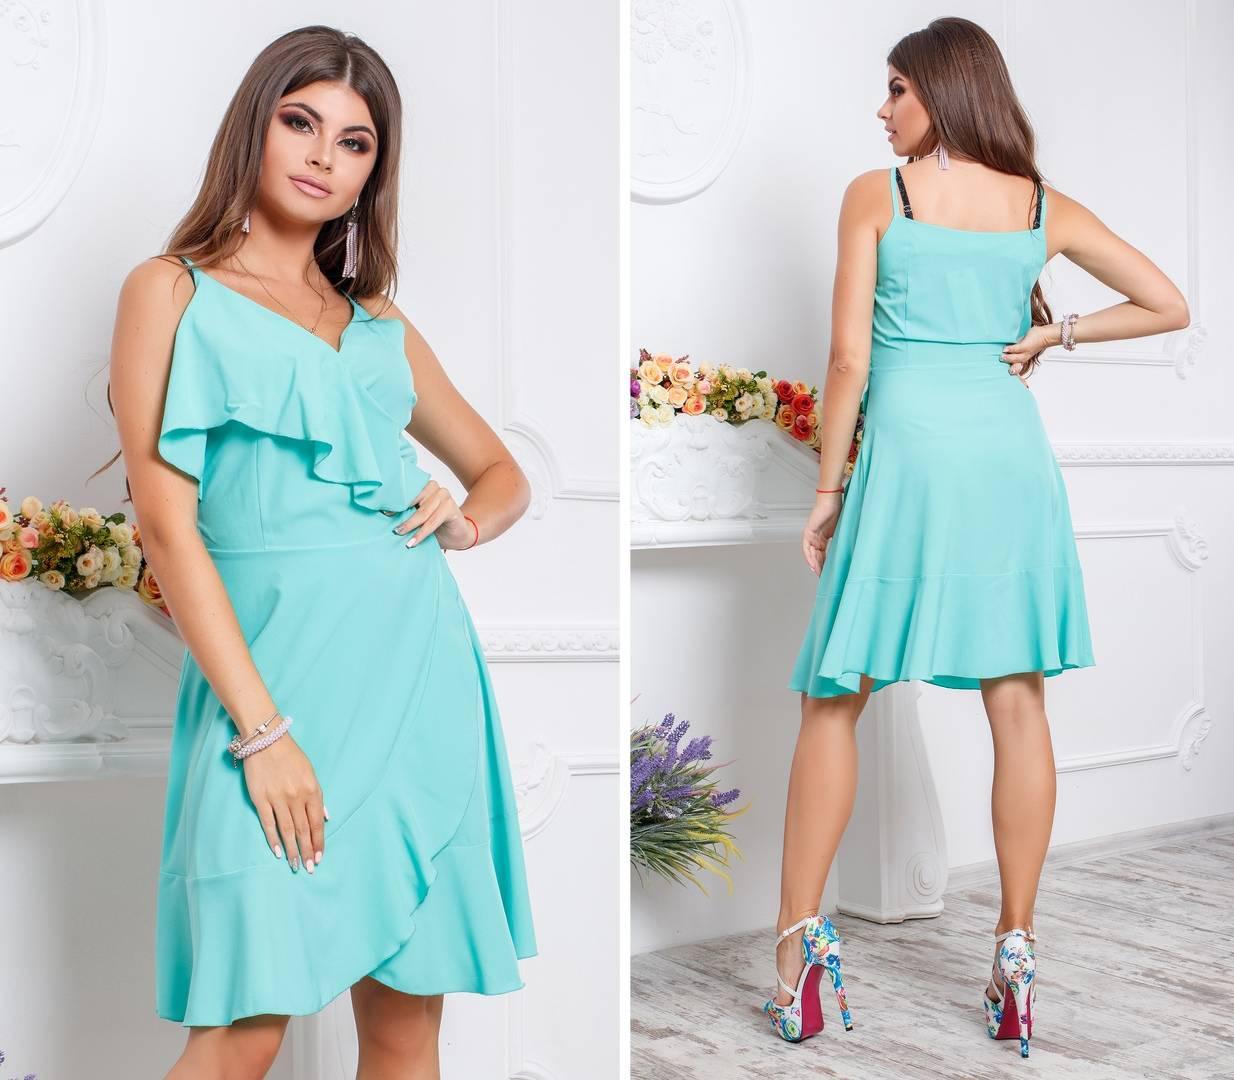 Новинка! Платье ( арт. 112 ), ткань супер софт, цвет бирюза